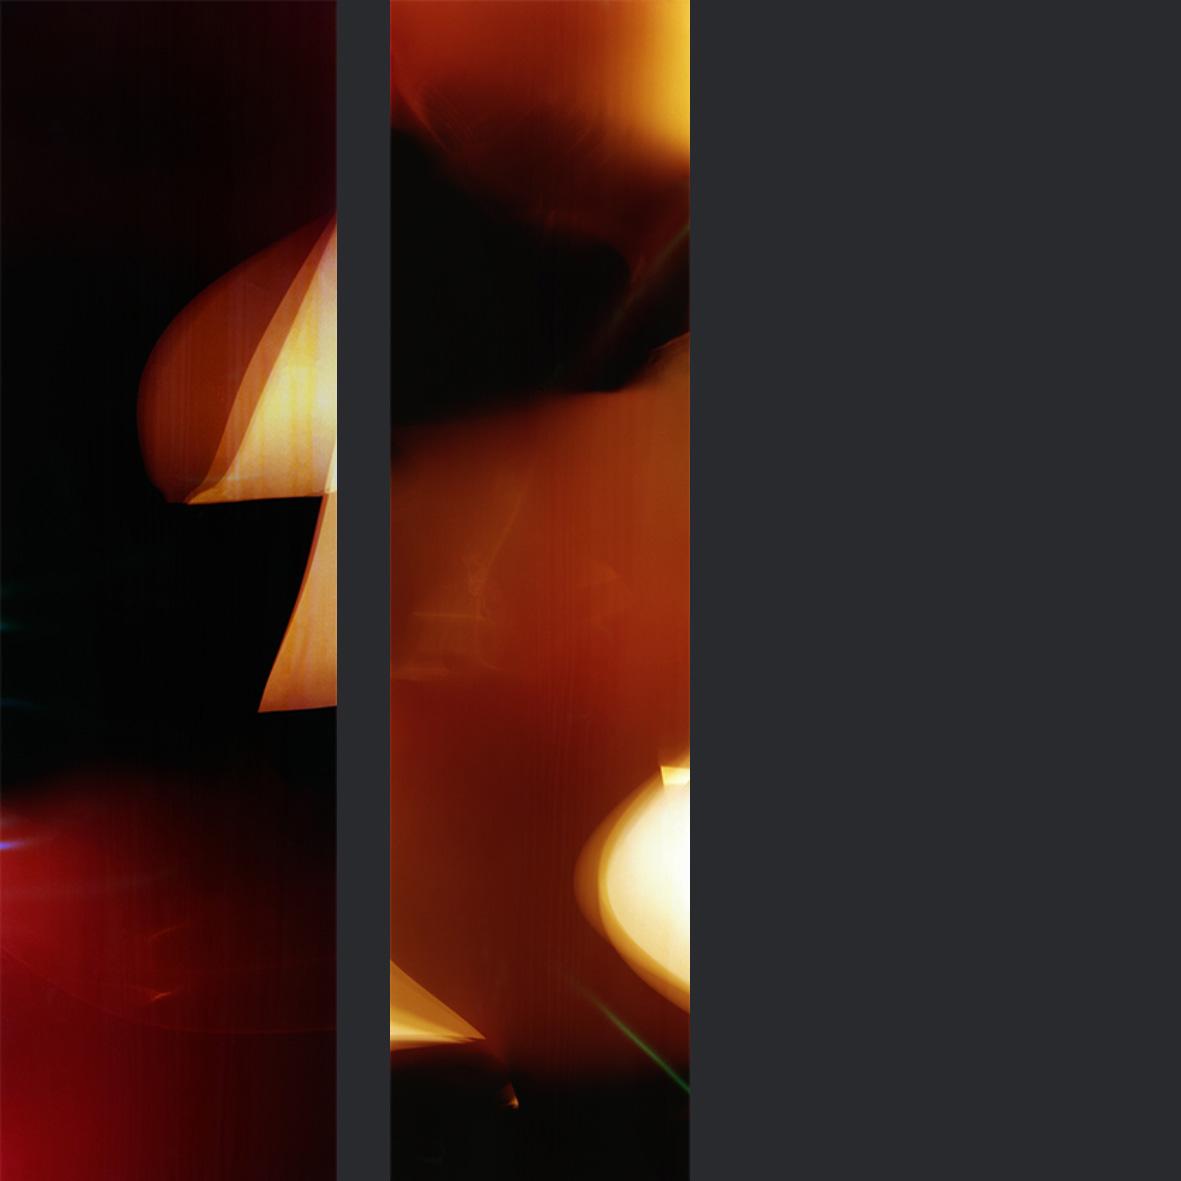 Anya Ramparsad After Hours (series) 2017 Medium format film, ISO 100, Digital Print, Vinyl 38 x 120 cm